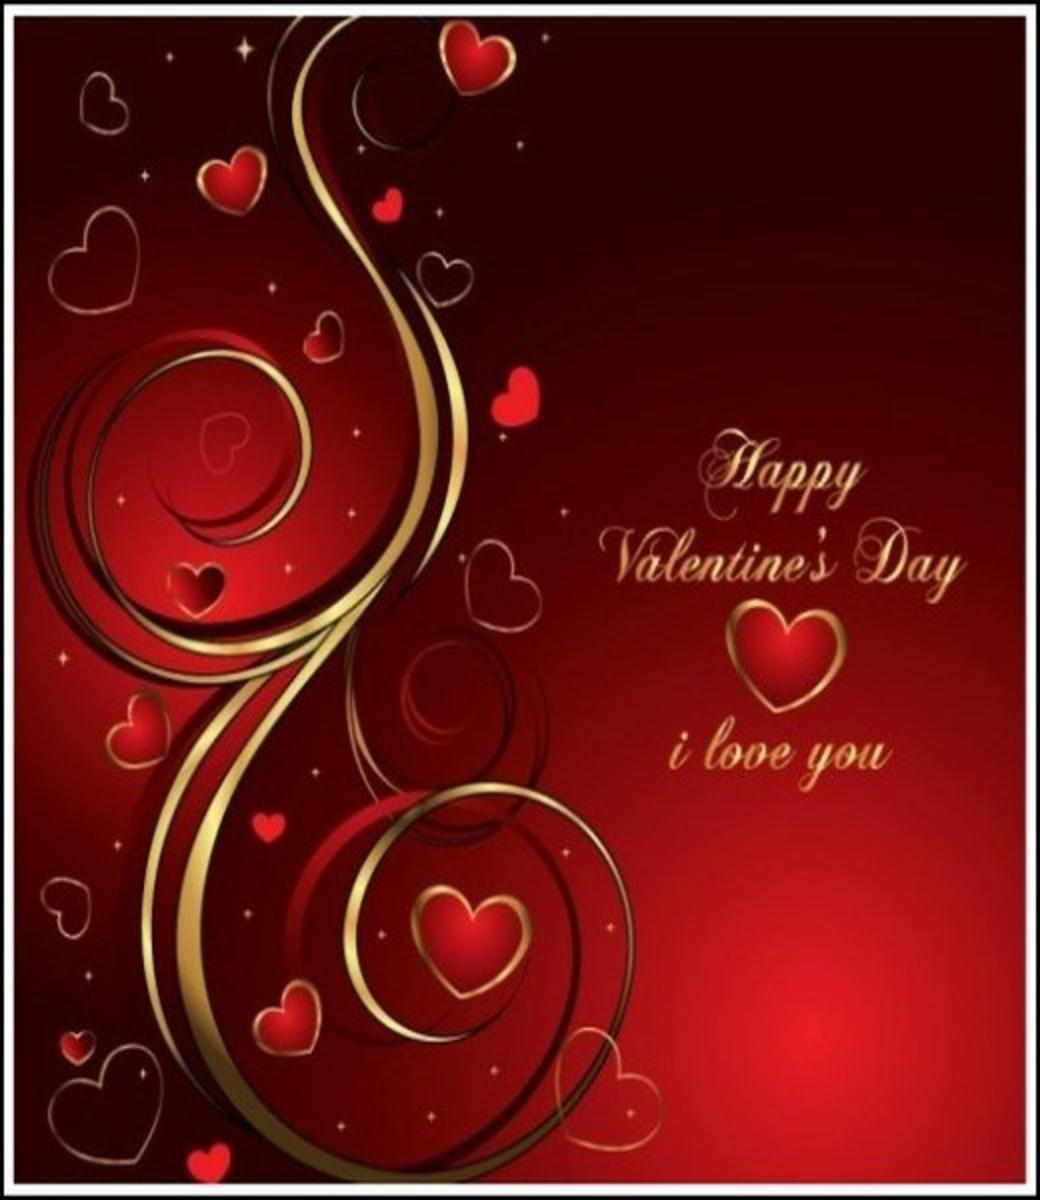 I Love You Valentine's Day Card